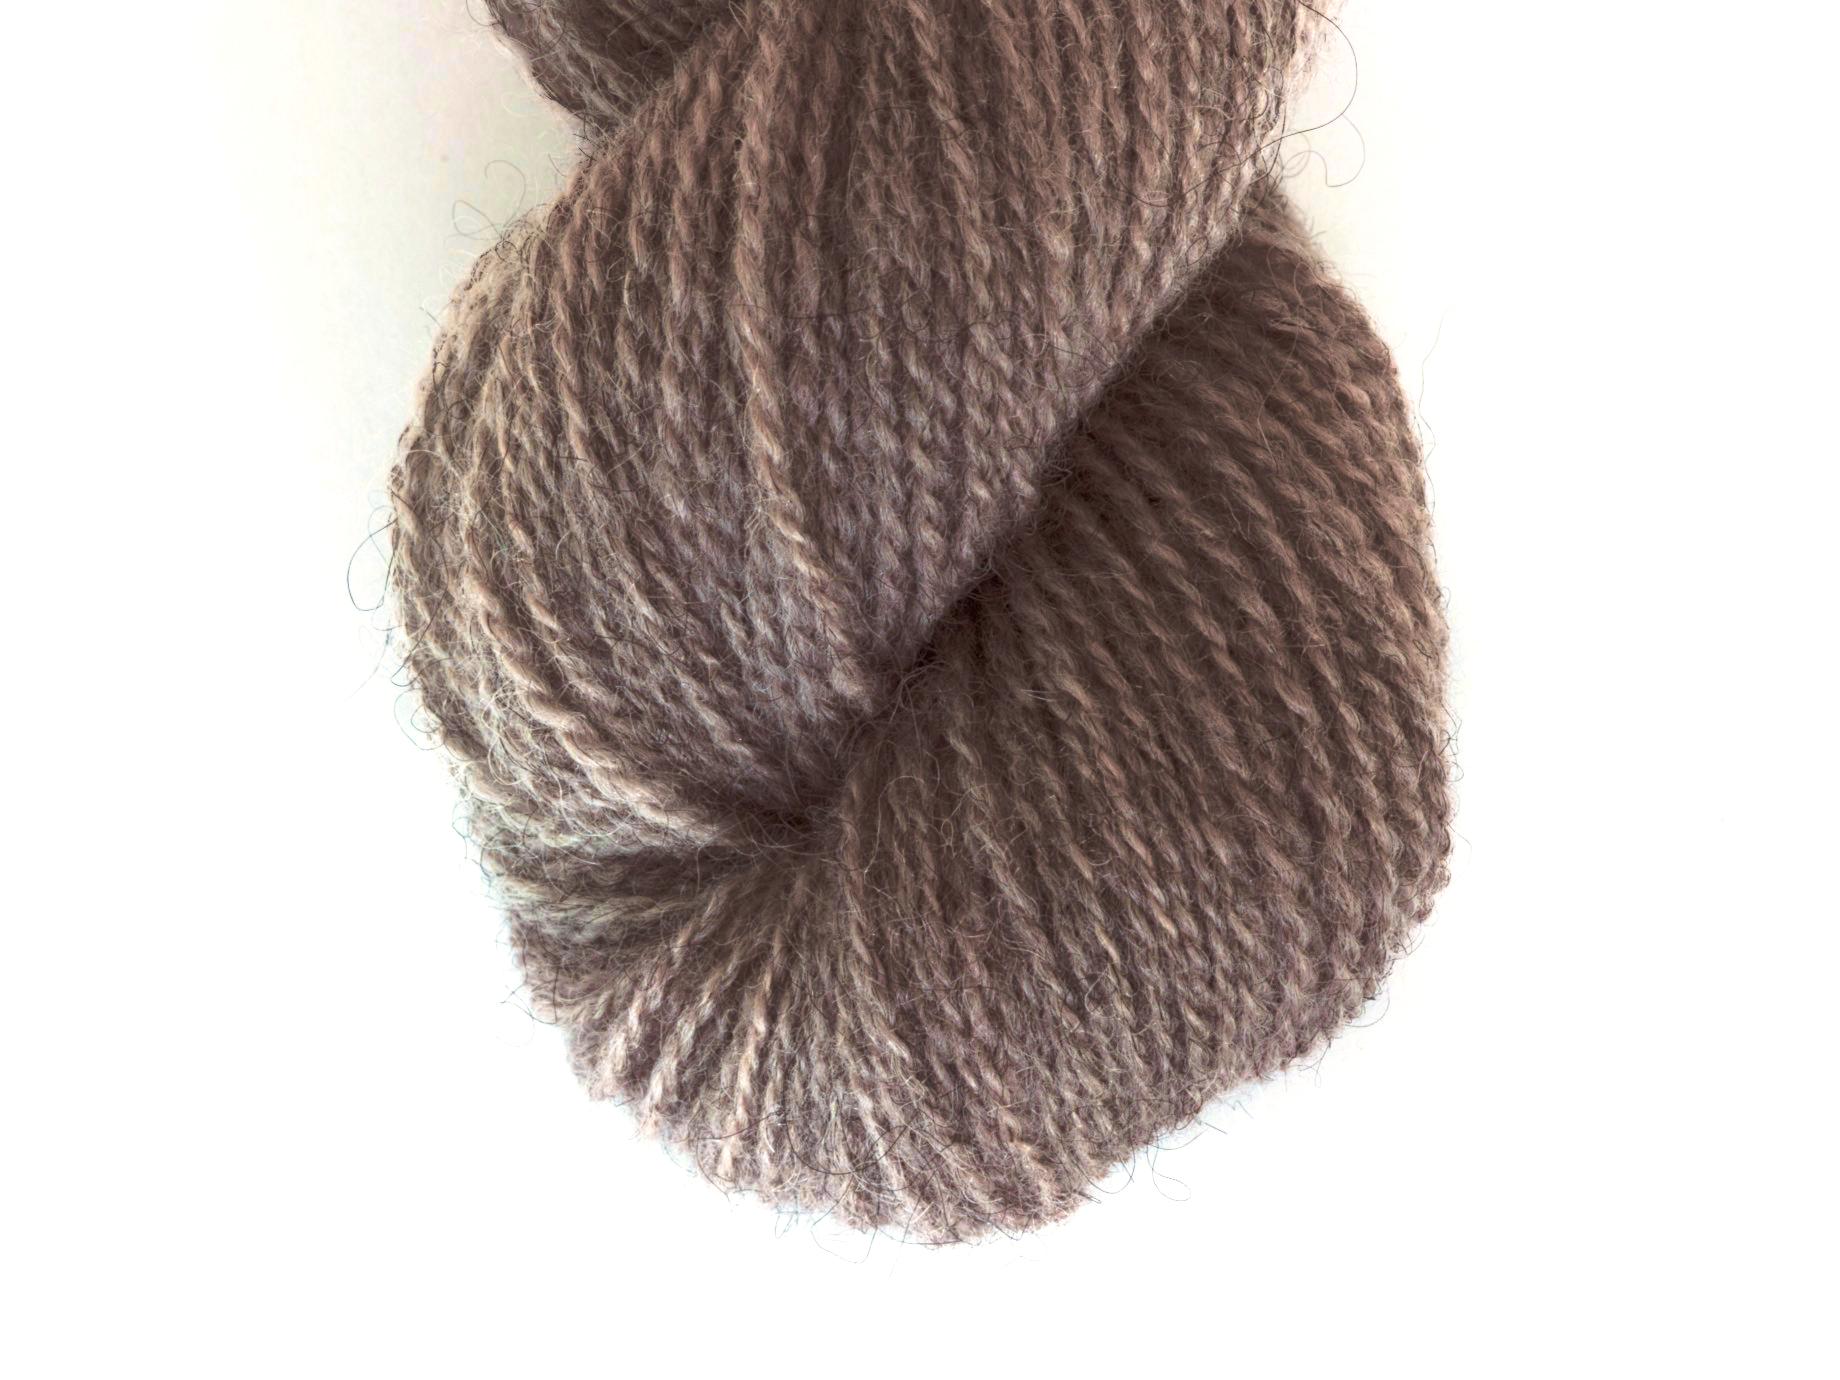 Bohus Stickning garn yarn BS 115 brown lambswool